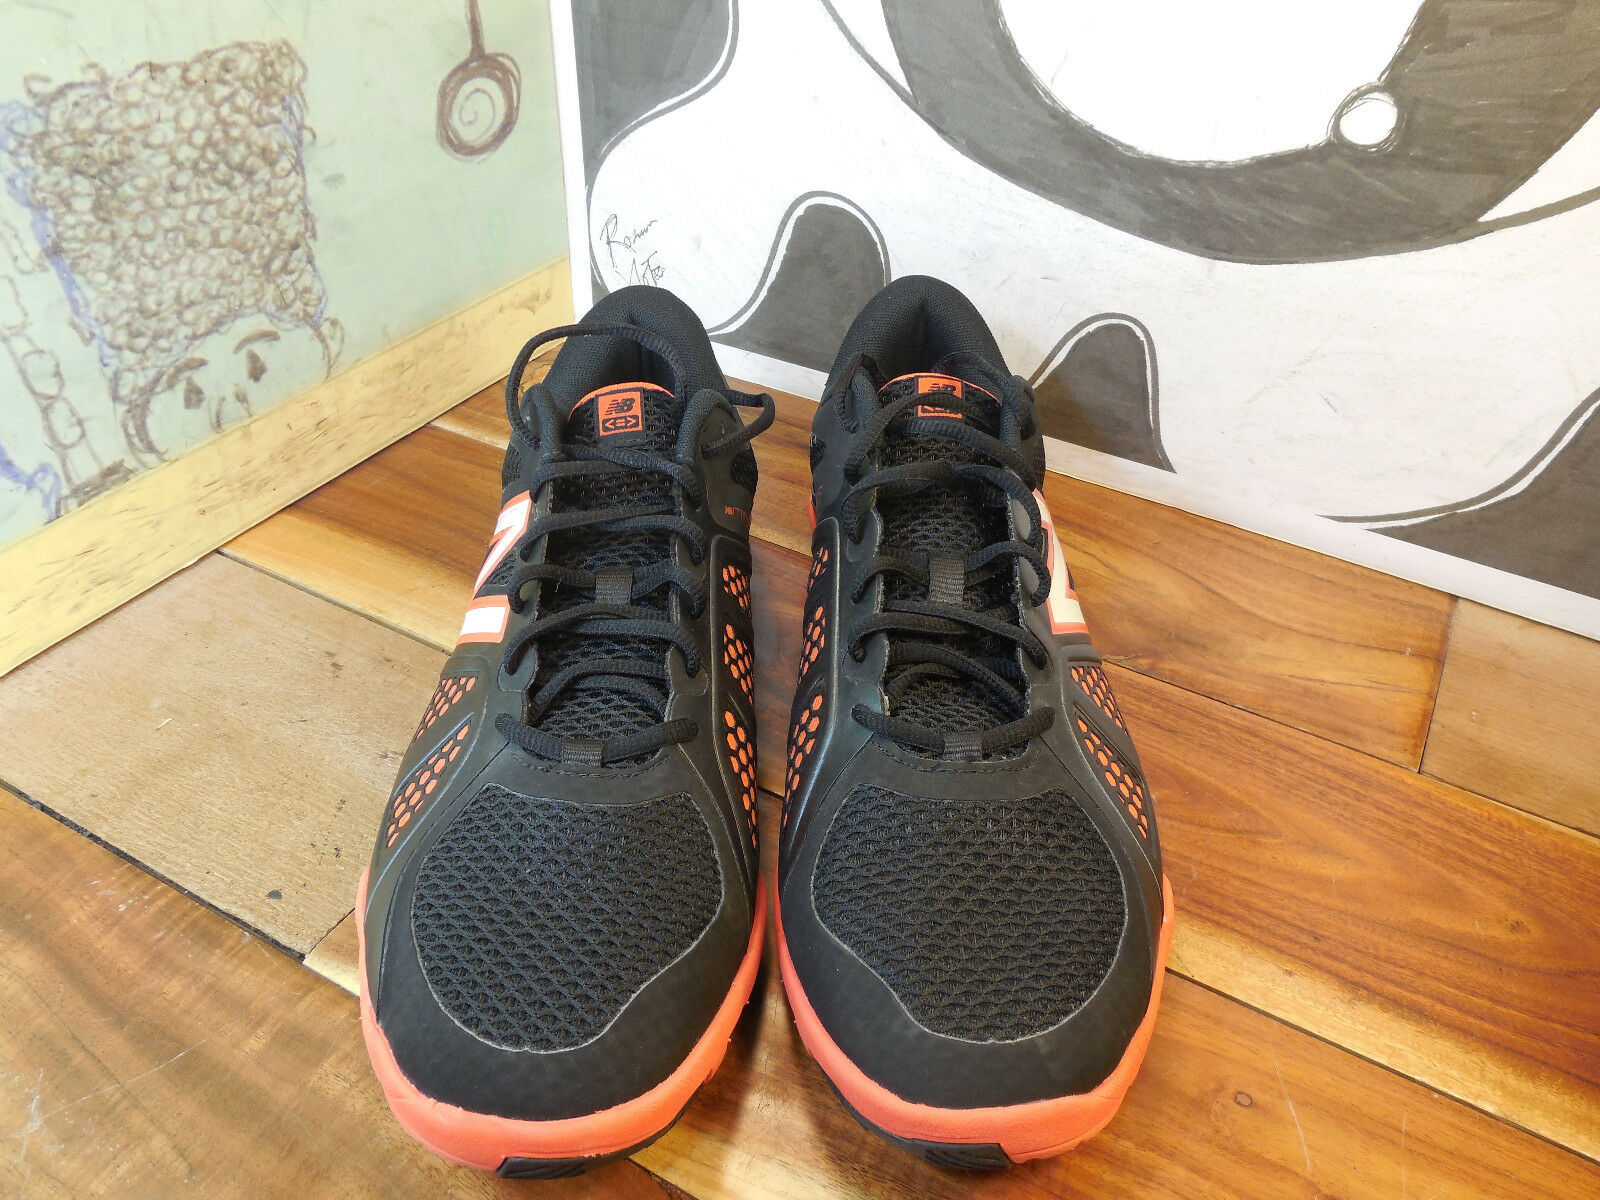 New Balance Minimus Black/Orange Running Shoes Men's 13EE New w/o Box #MX20BO2